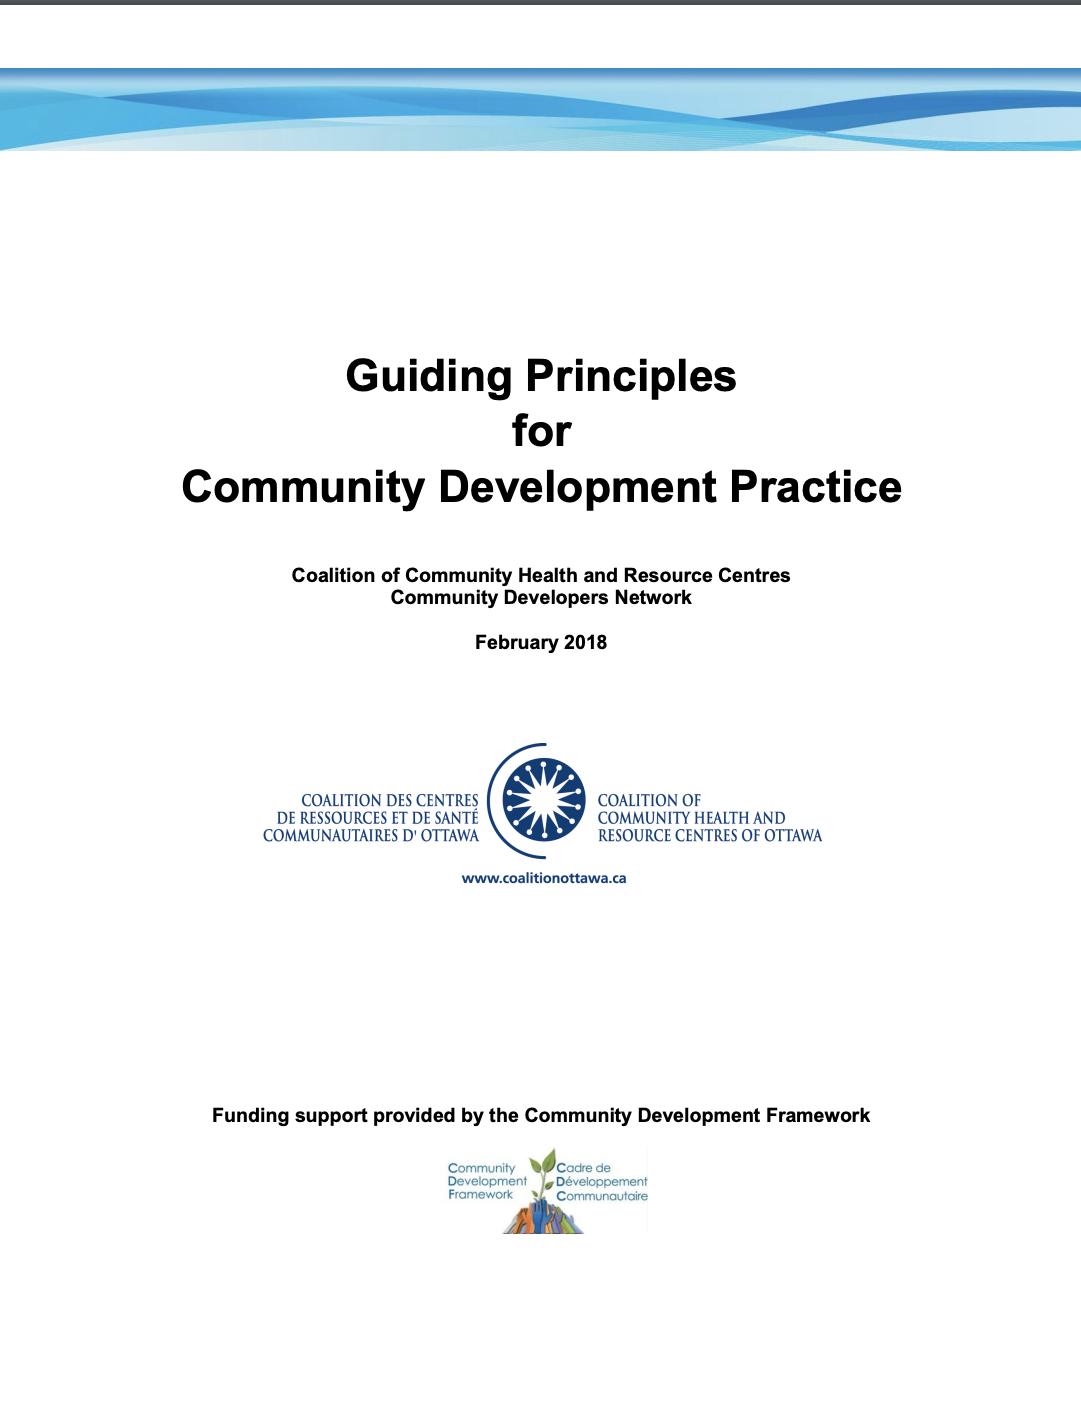 Guiding Principles for Community Development Practice